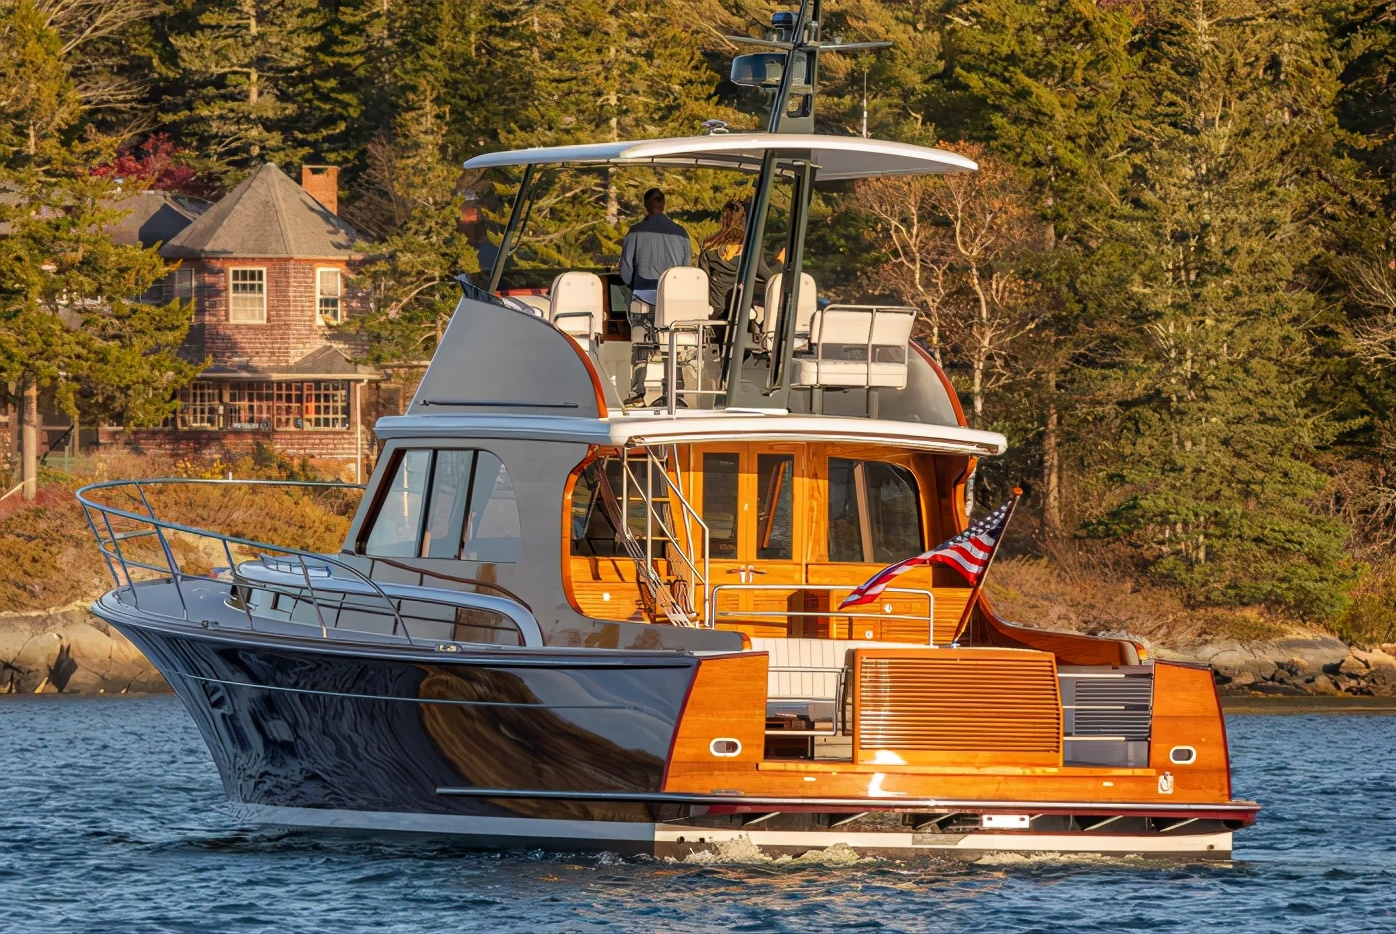 Lyman Morse造船厂推出高性能巡洋艇Hood 57